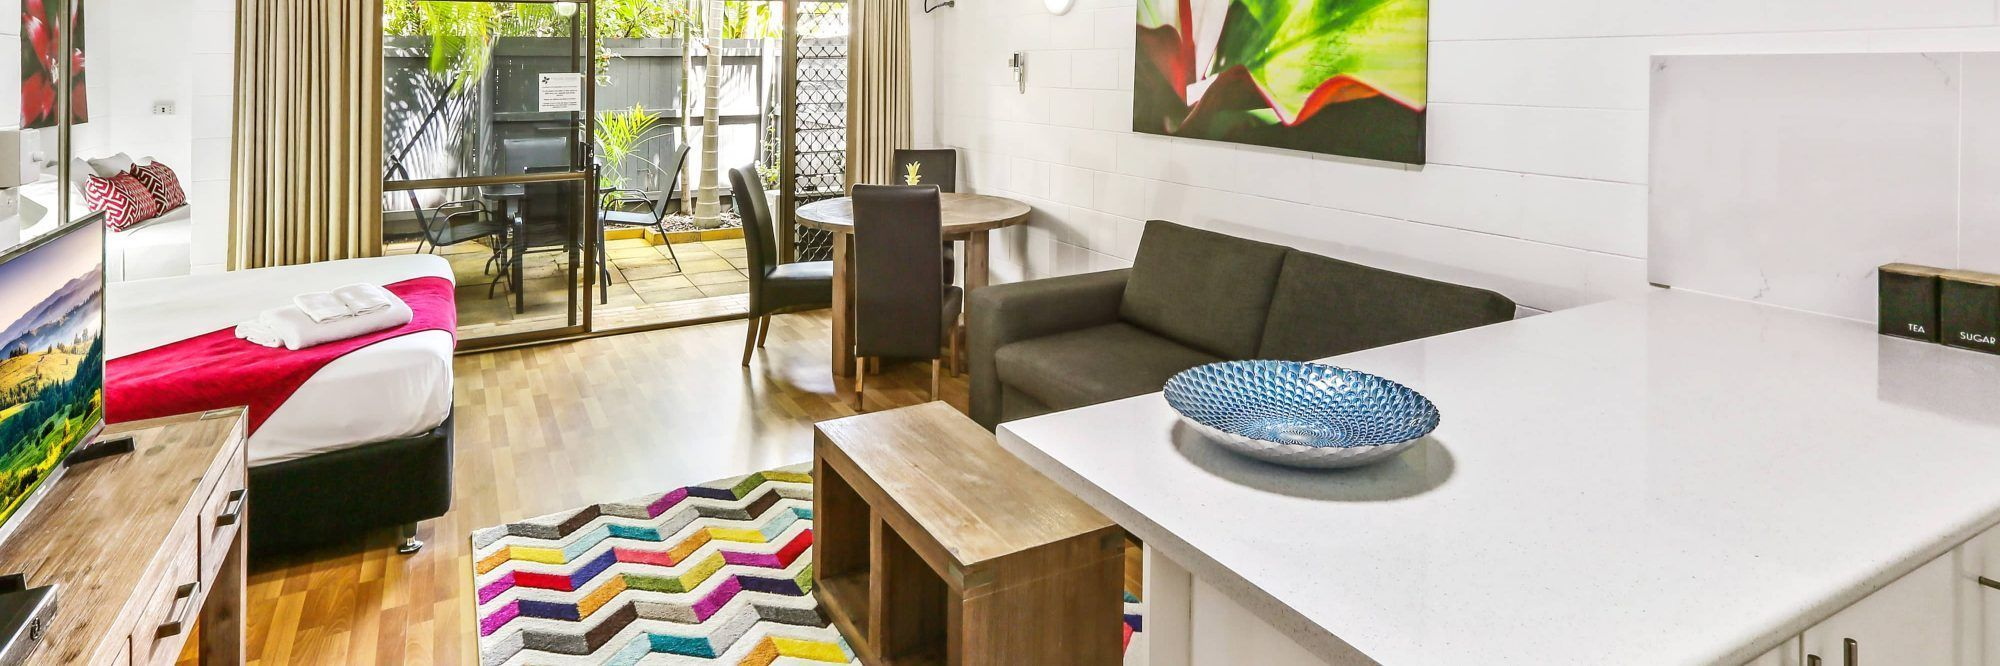 cairns accommodation specials cascade gardens. Black Bedroom Furniture Sets. Home Design Ideas